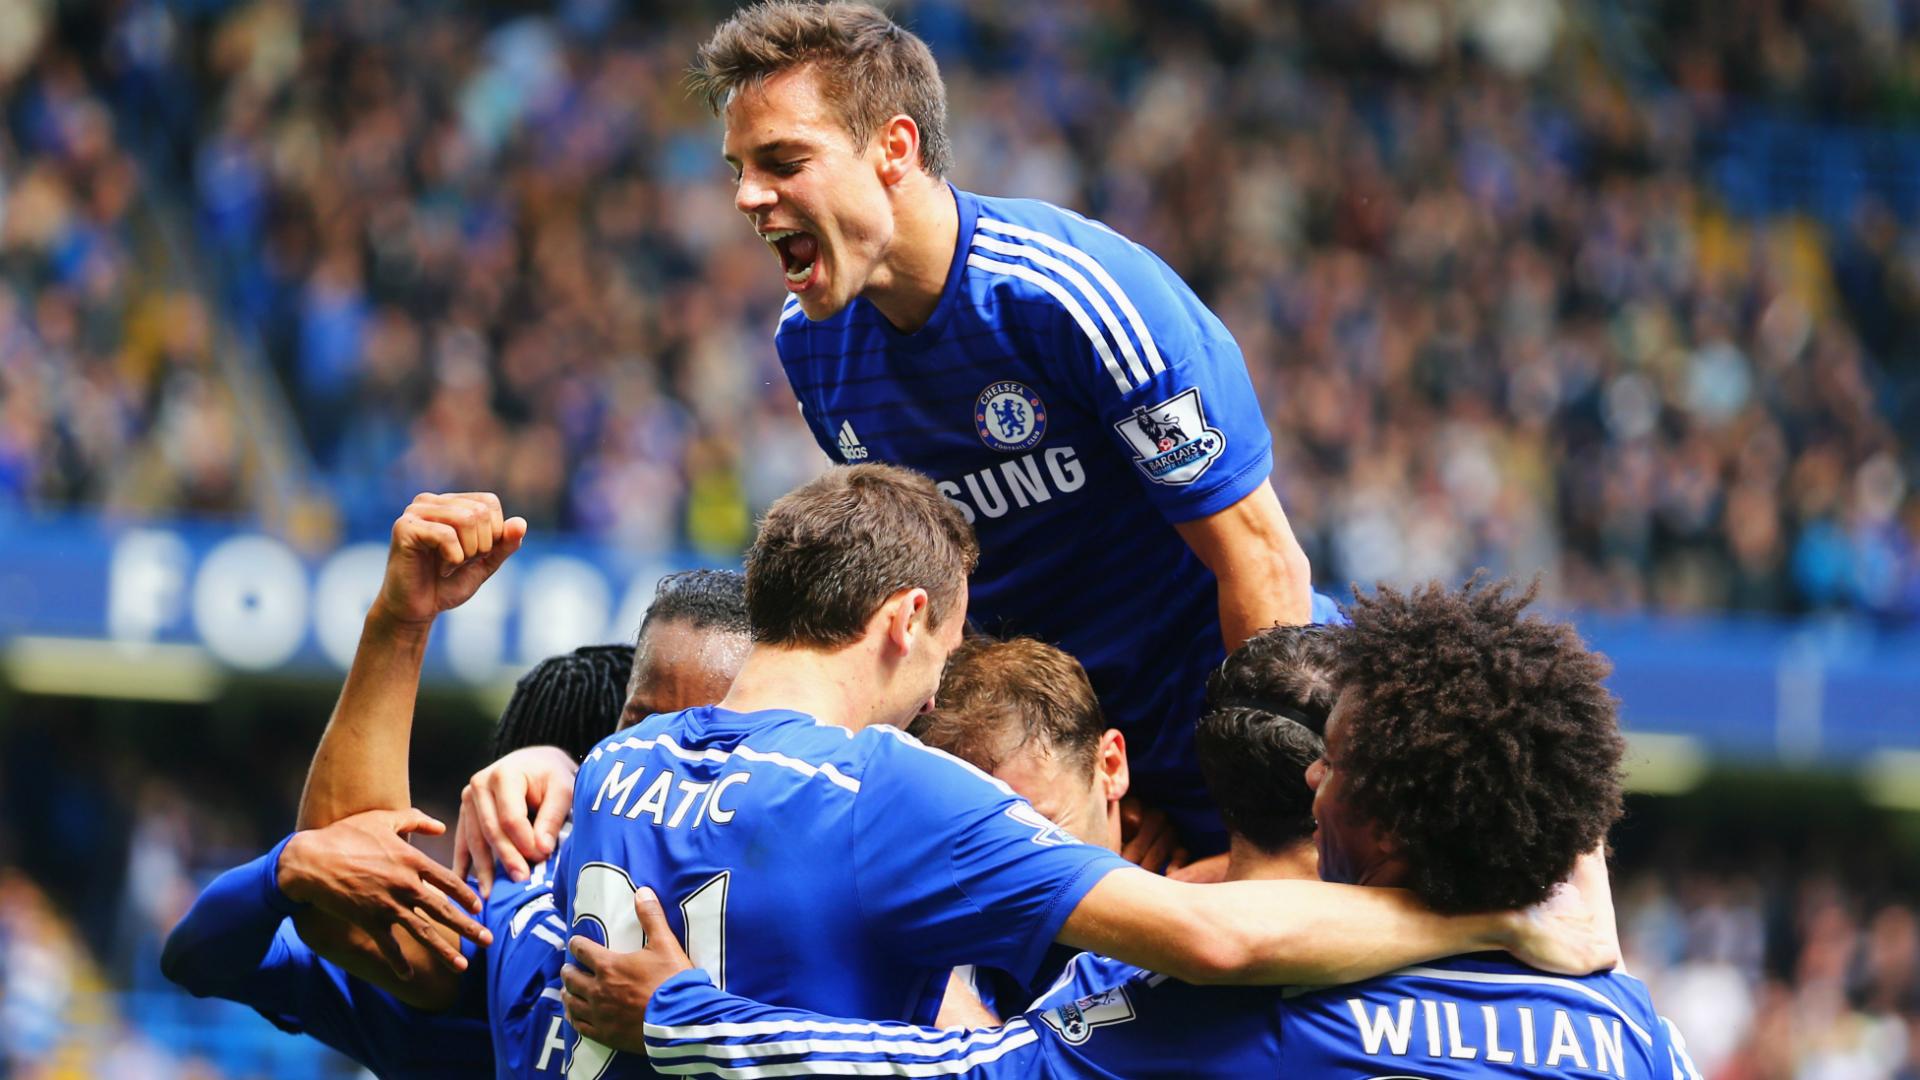 Chelsea celebrate vs Crystal Palace - Goal.com